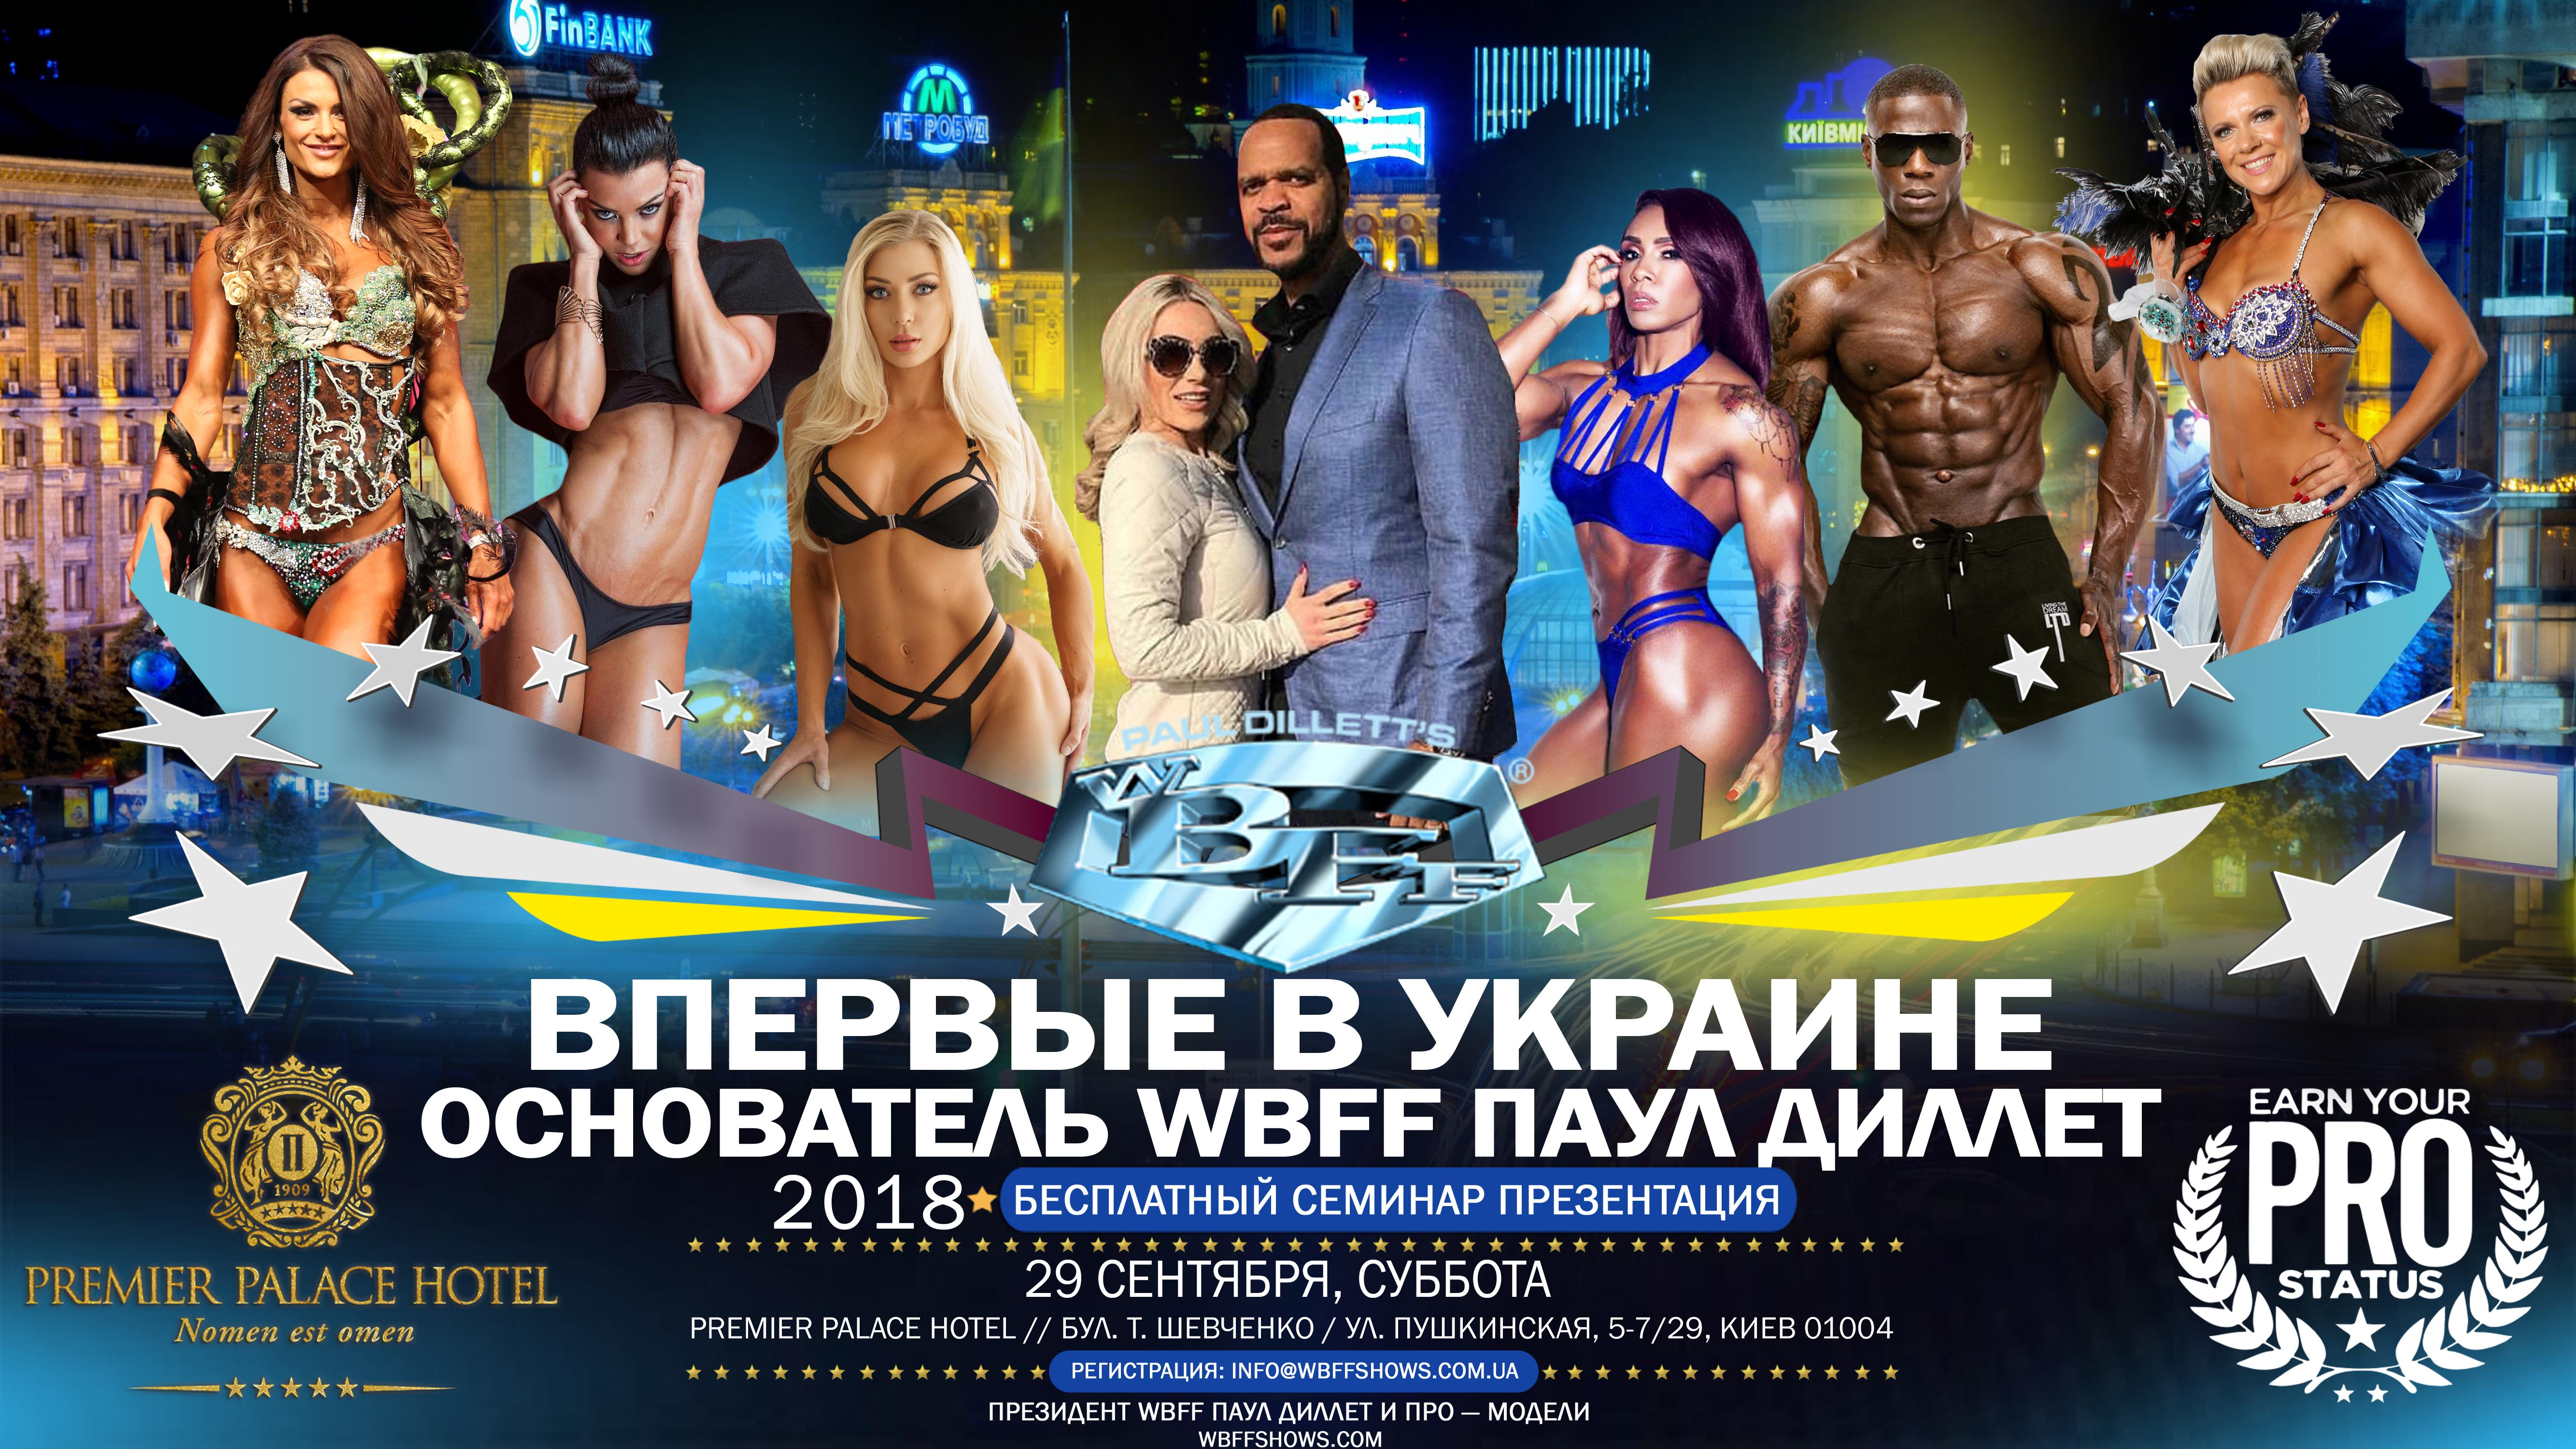 wbff in ukraine